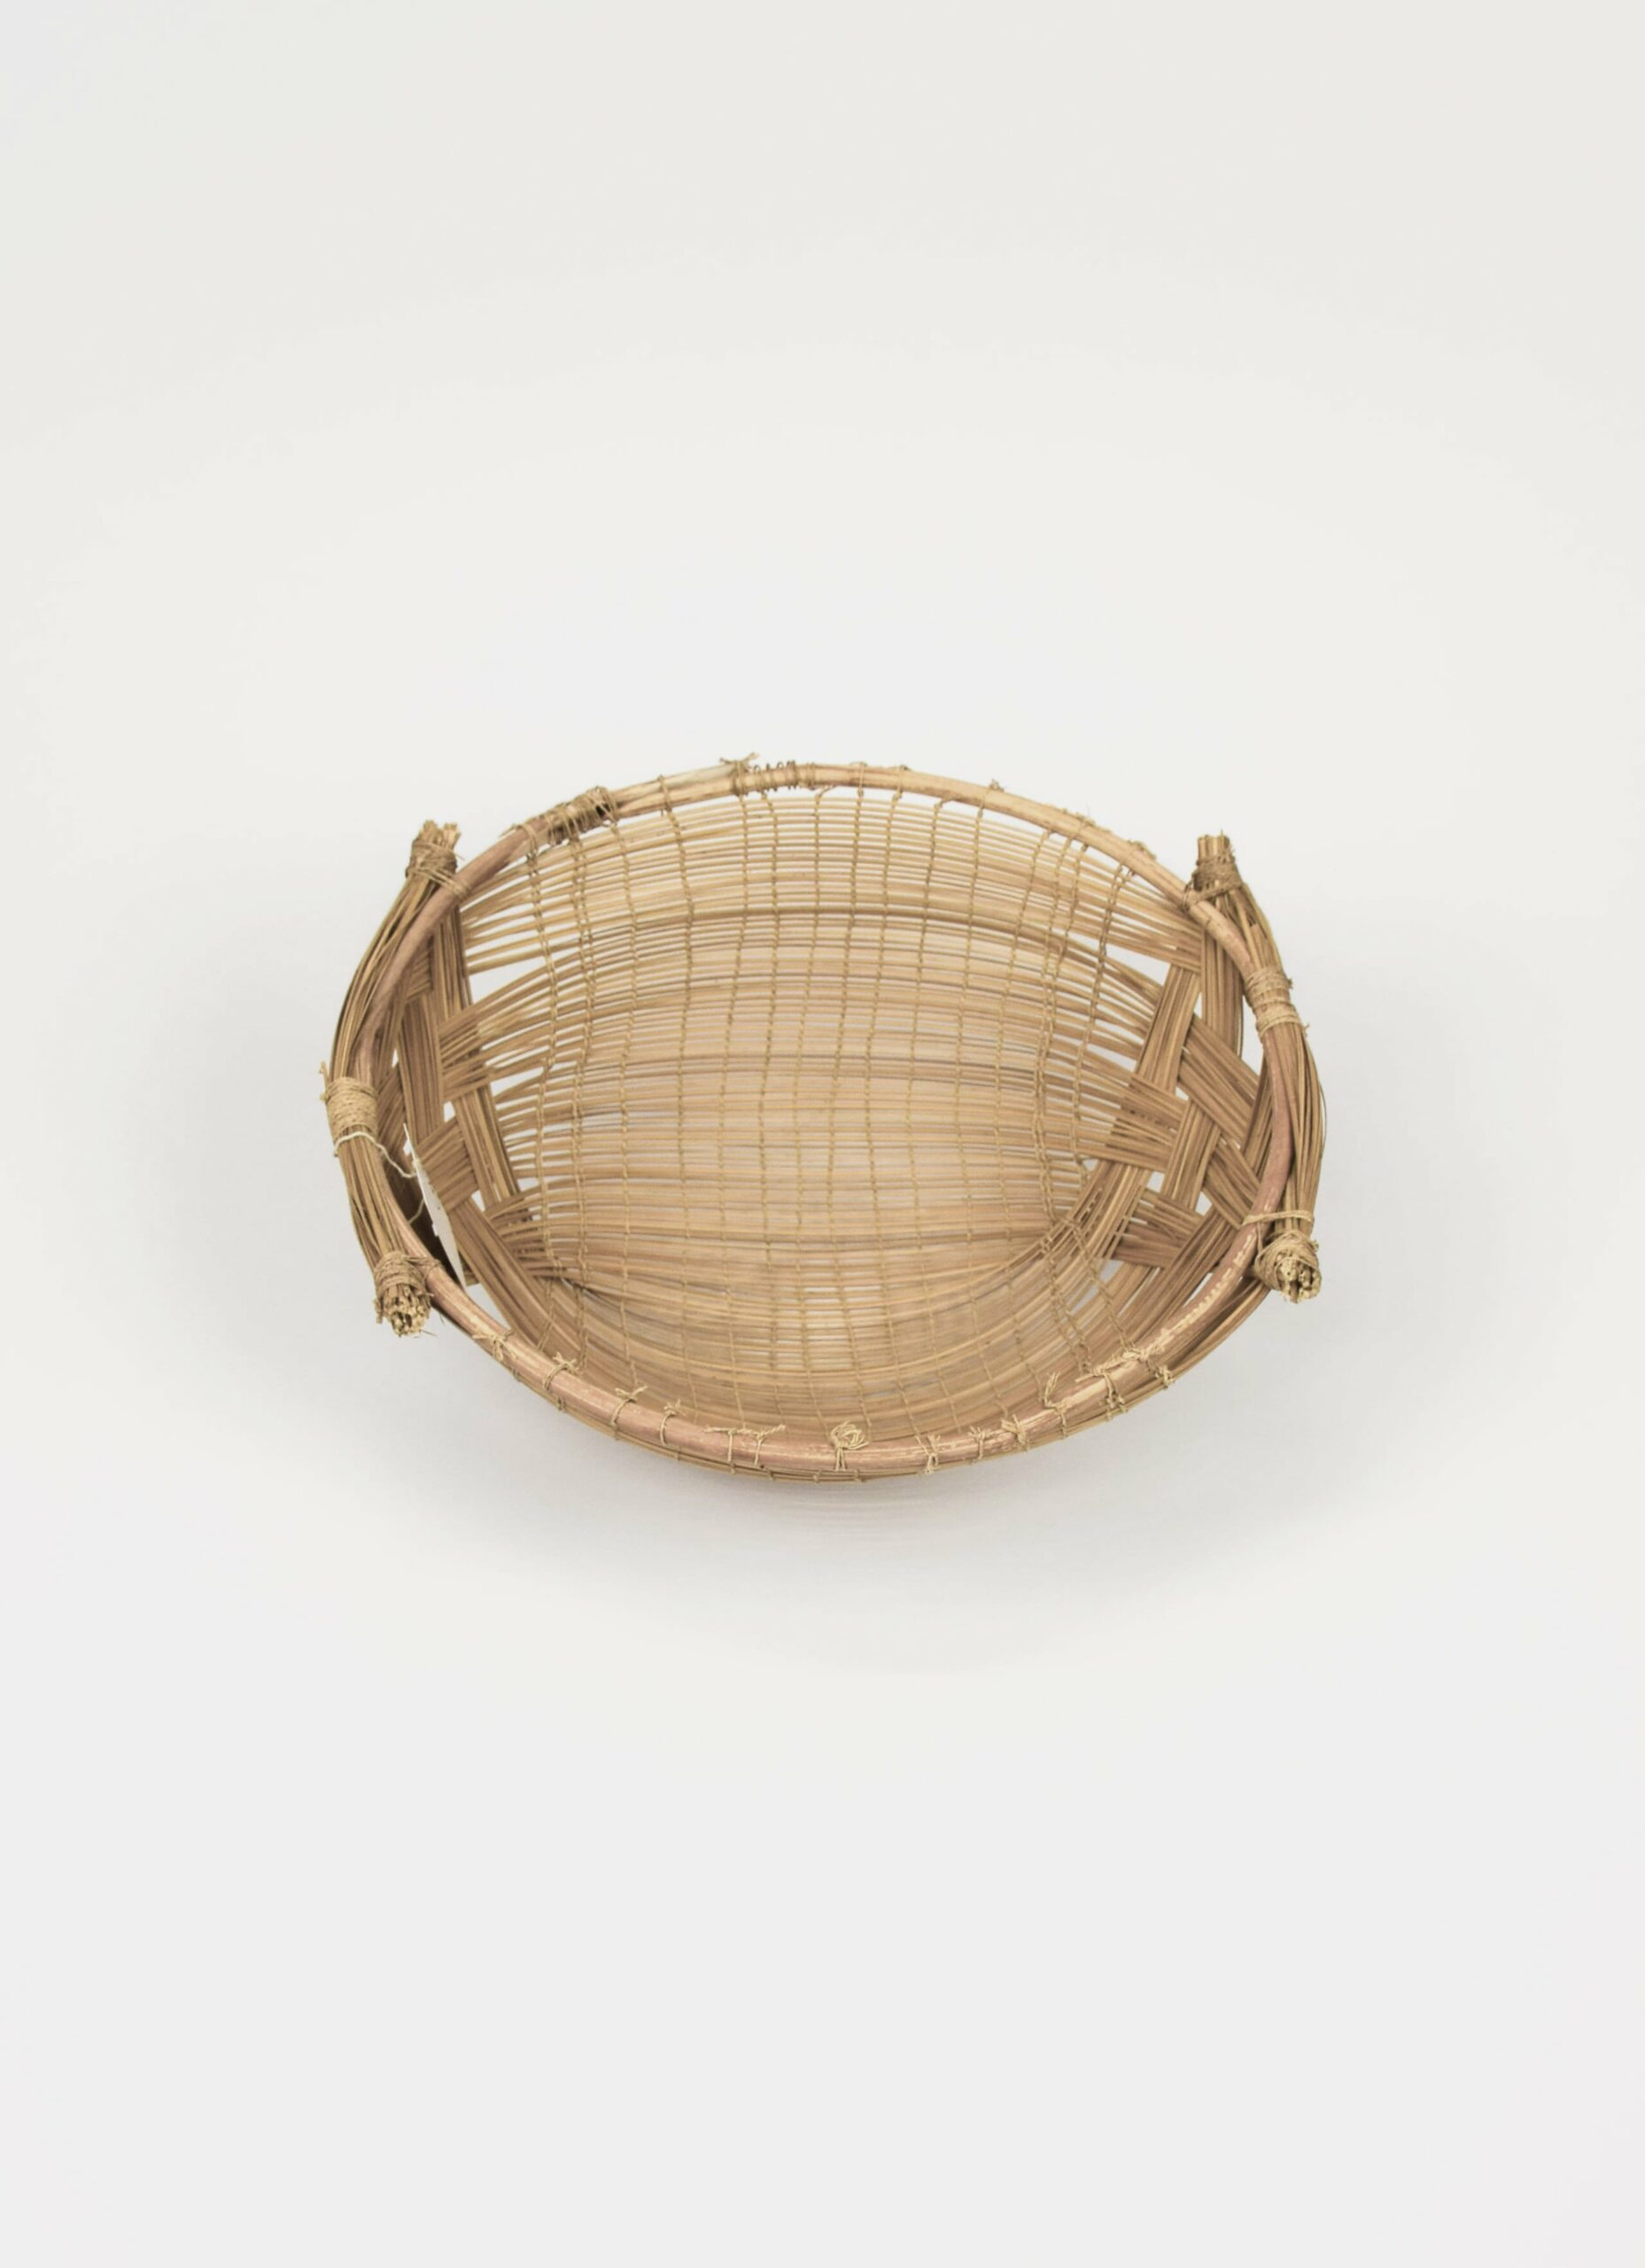 Incausa - Mehinako People - Traditional Fishing Basket - M